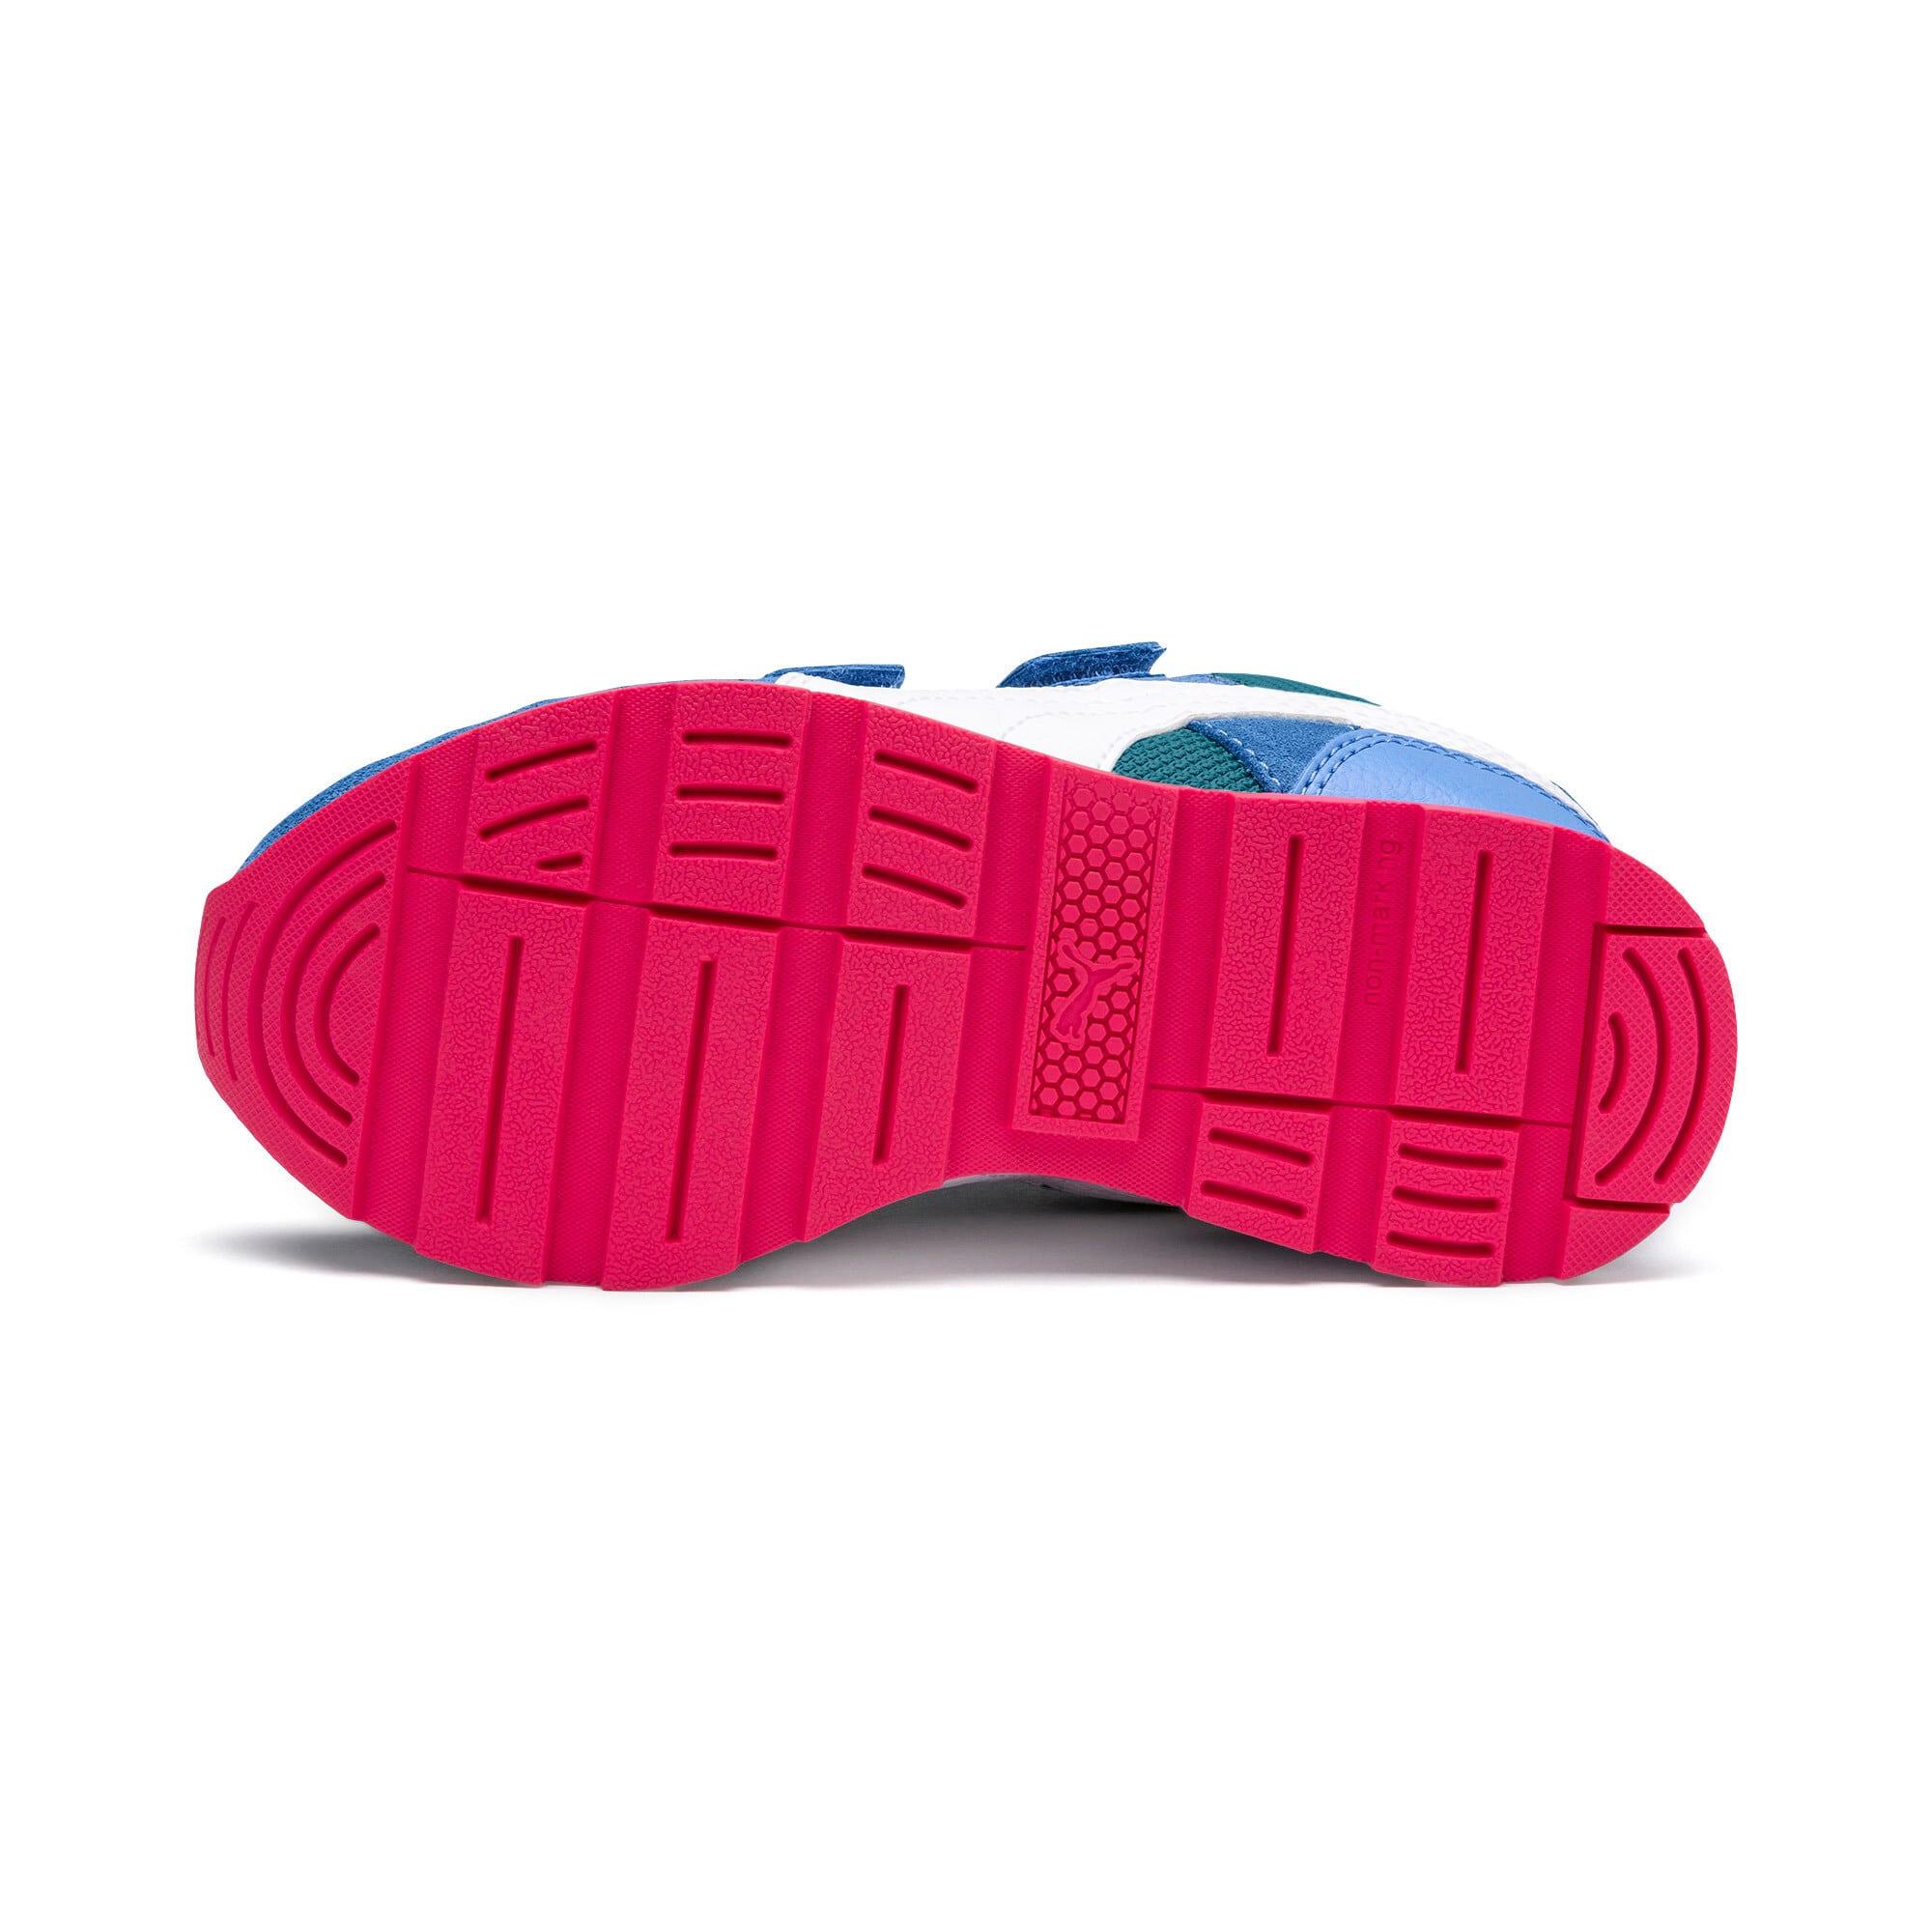 Miniatura 2 de Zapatos Vista para niños, Ultramarine-Puma White, mediano